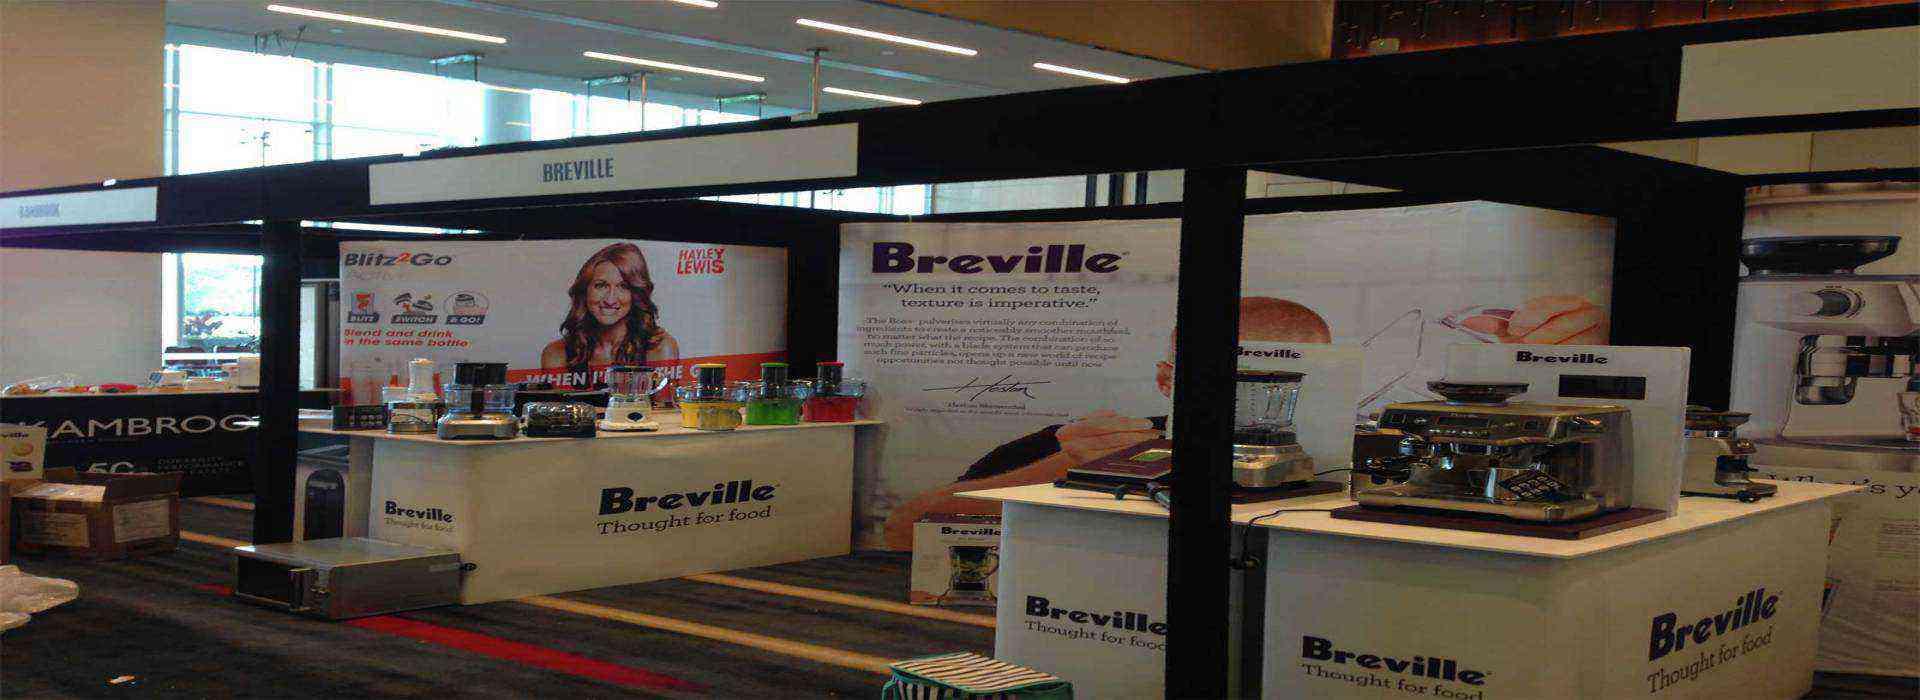 Breville australia customer service number head office - David jones head office australia ...